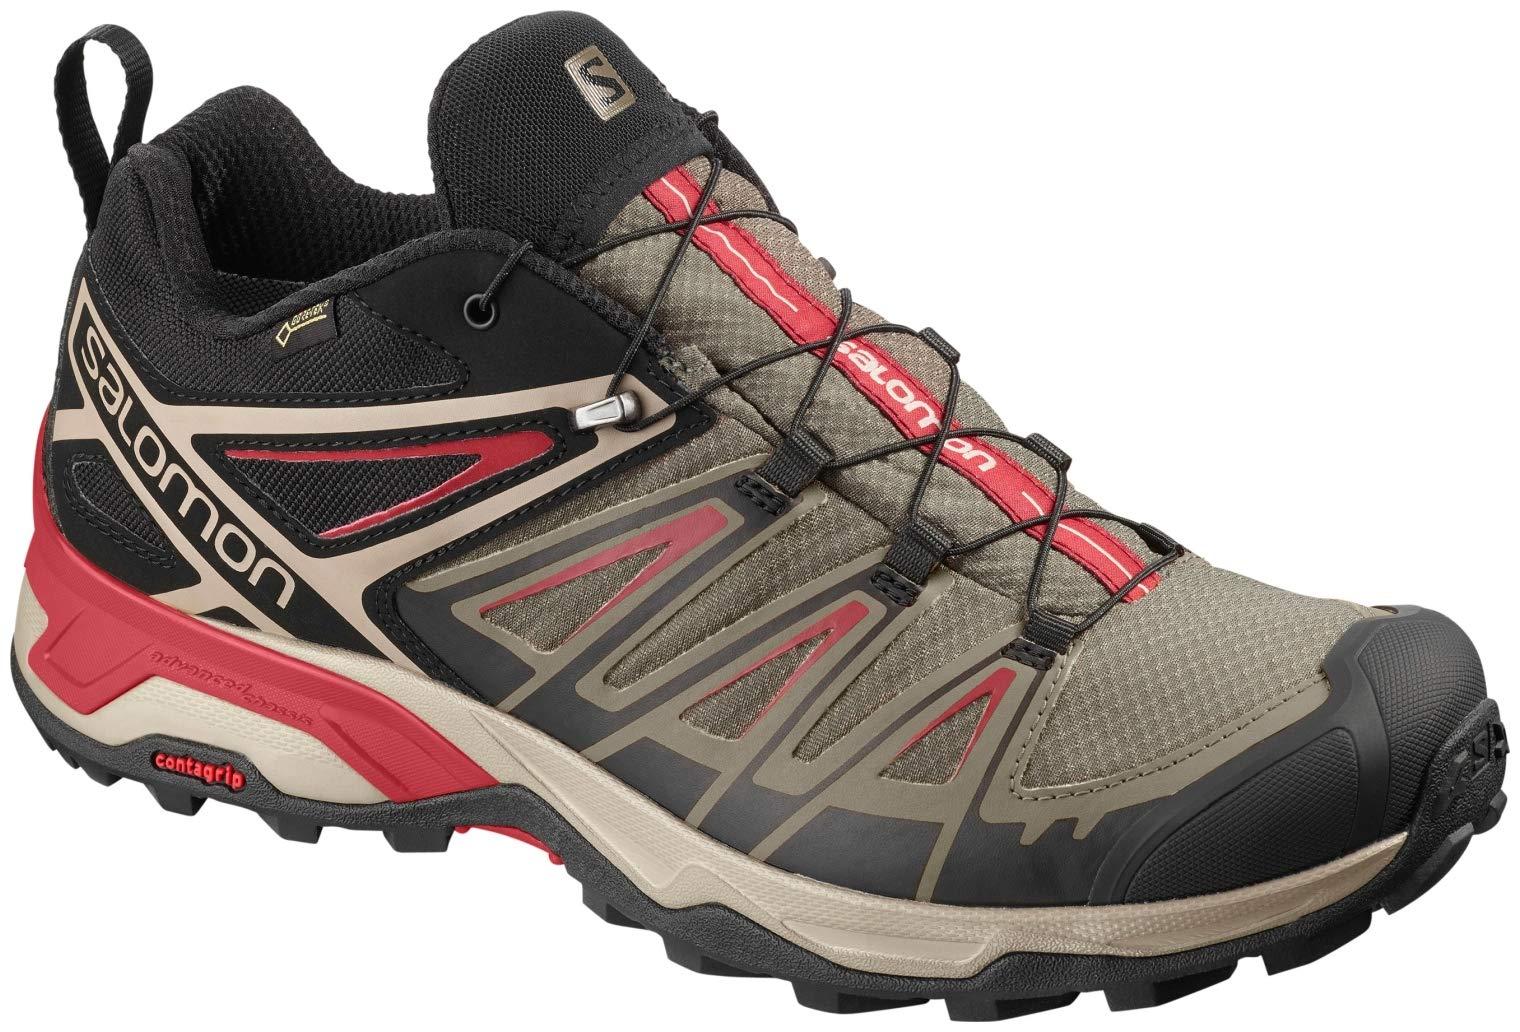 Salomon X Ultra 3 GTX Hiking Boots - Mens, Bungee Cord/Vintage Kaki/Red Dahlia, L40674900-11